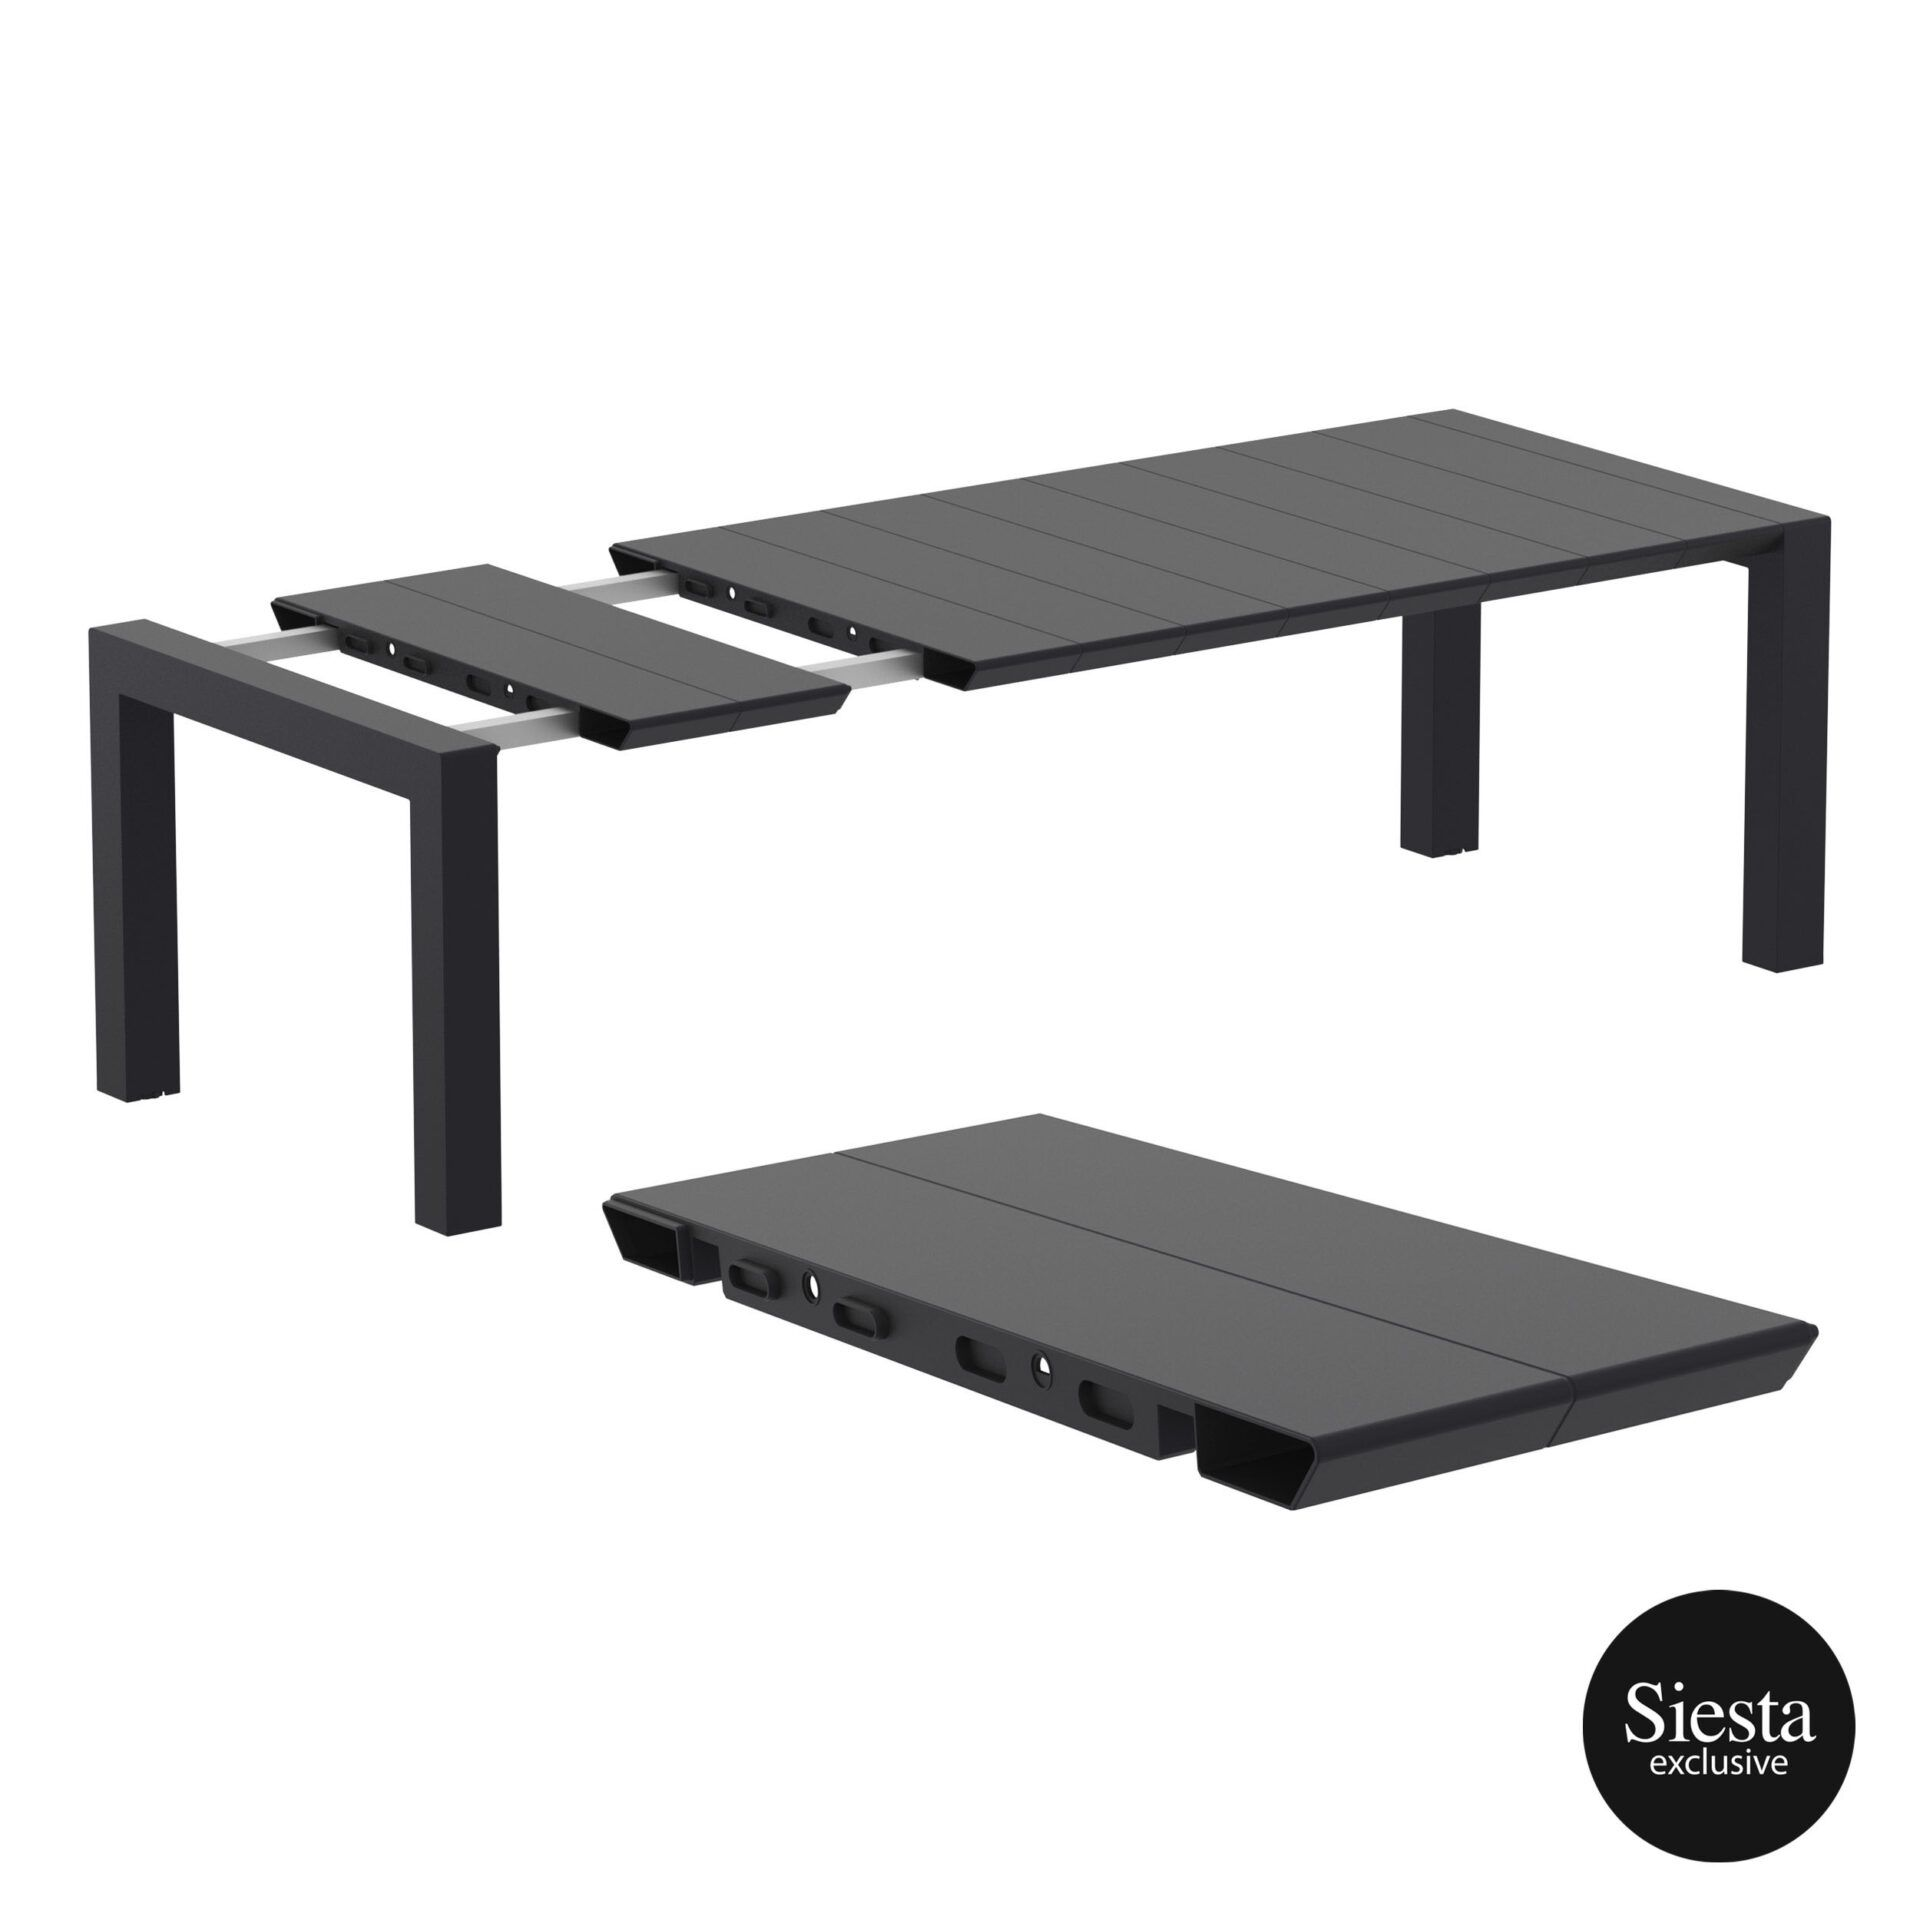 001 vegas table medium 220 black extension part